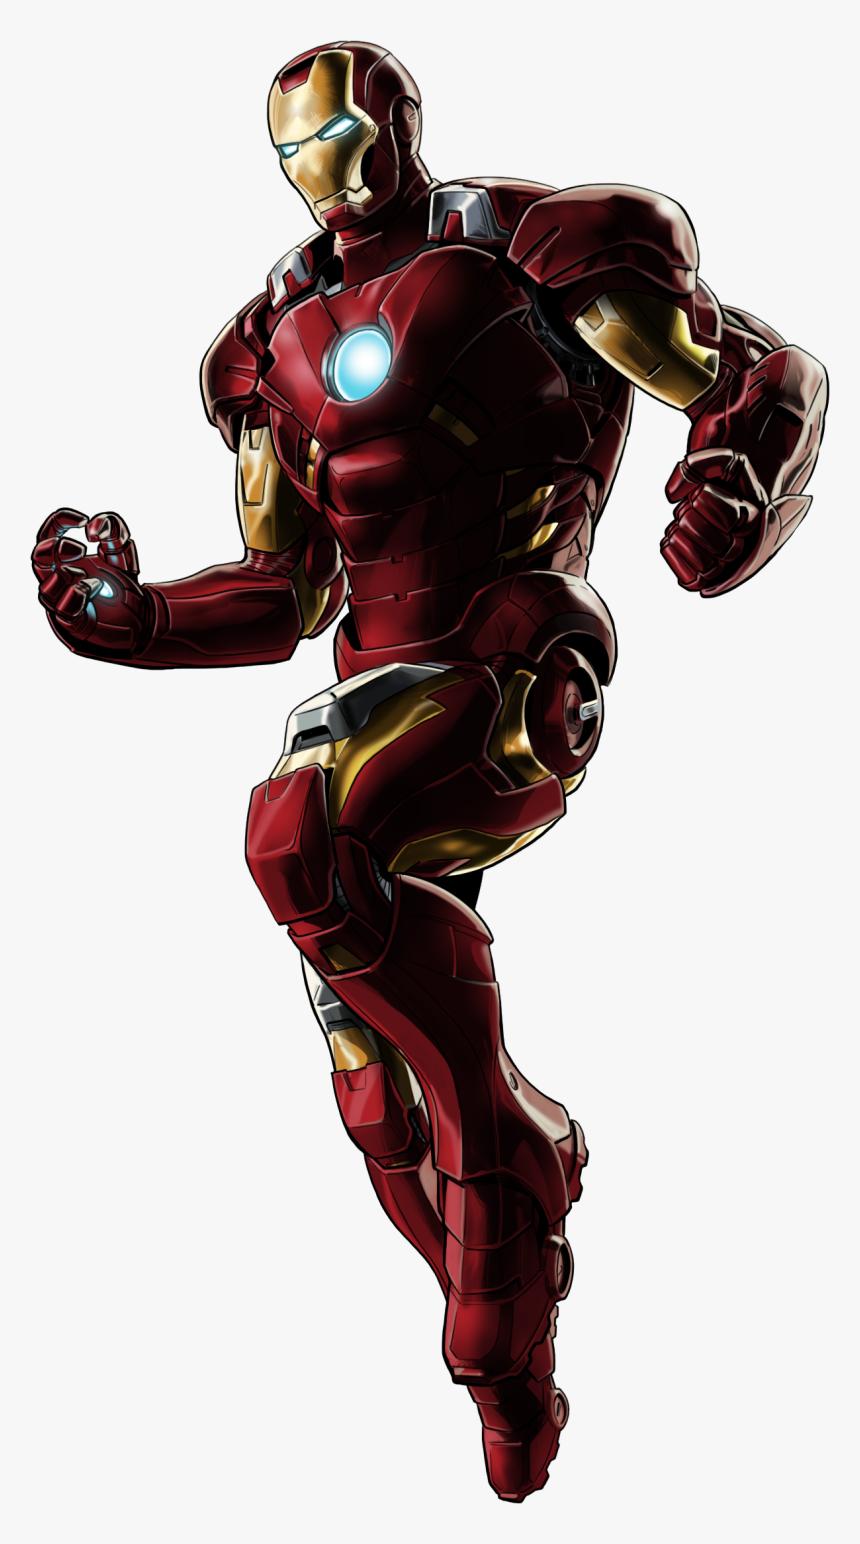 Ironman Flying Png Image - Iron Man Transparent Background, Png Download, Free Download